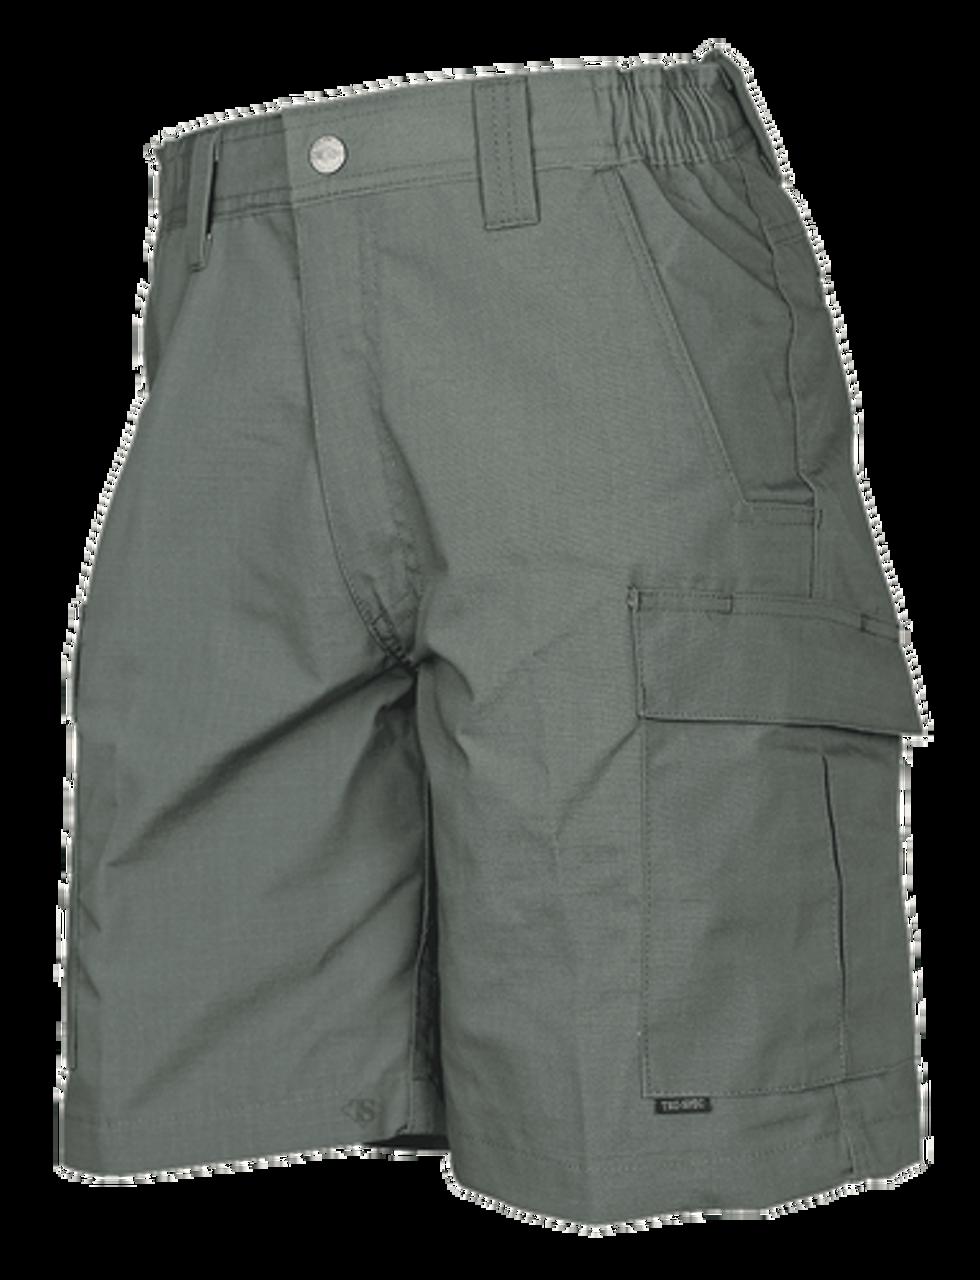 FREE SHIPPING Men's 24-7 Tactical Uniform Cargo Shorts by TRU-SPEC Zipper Fly